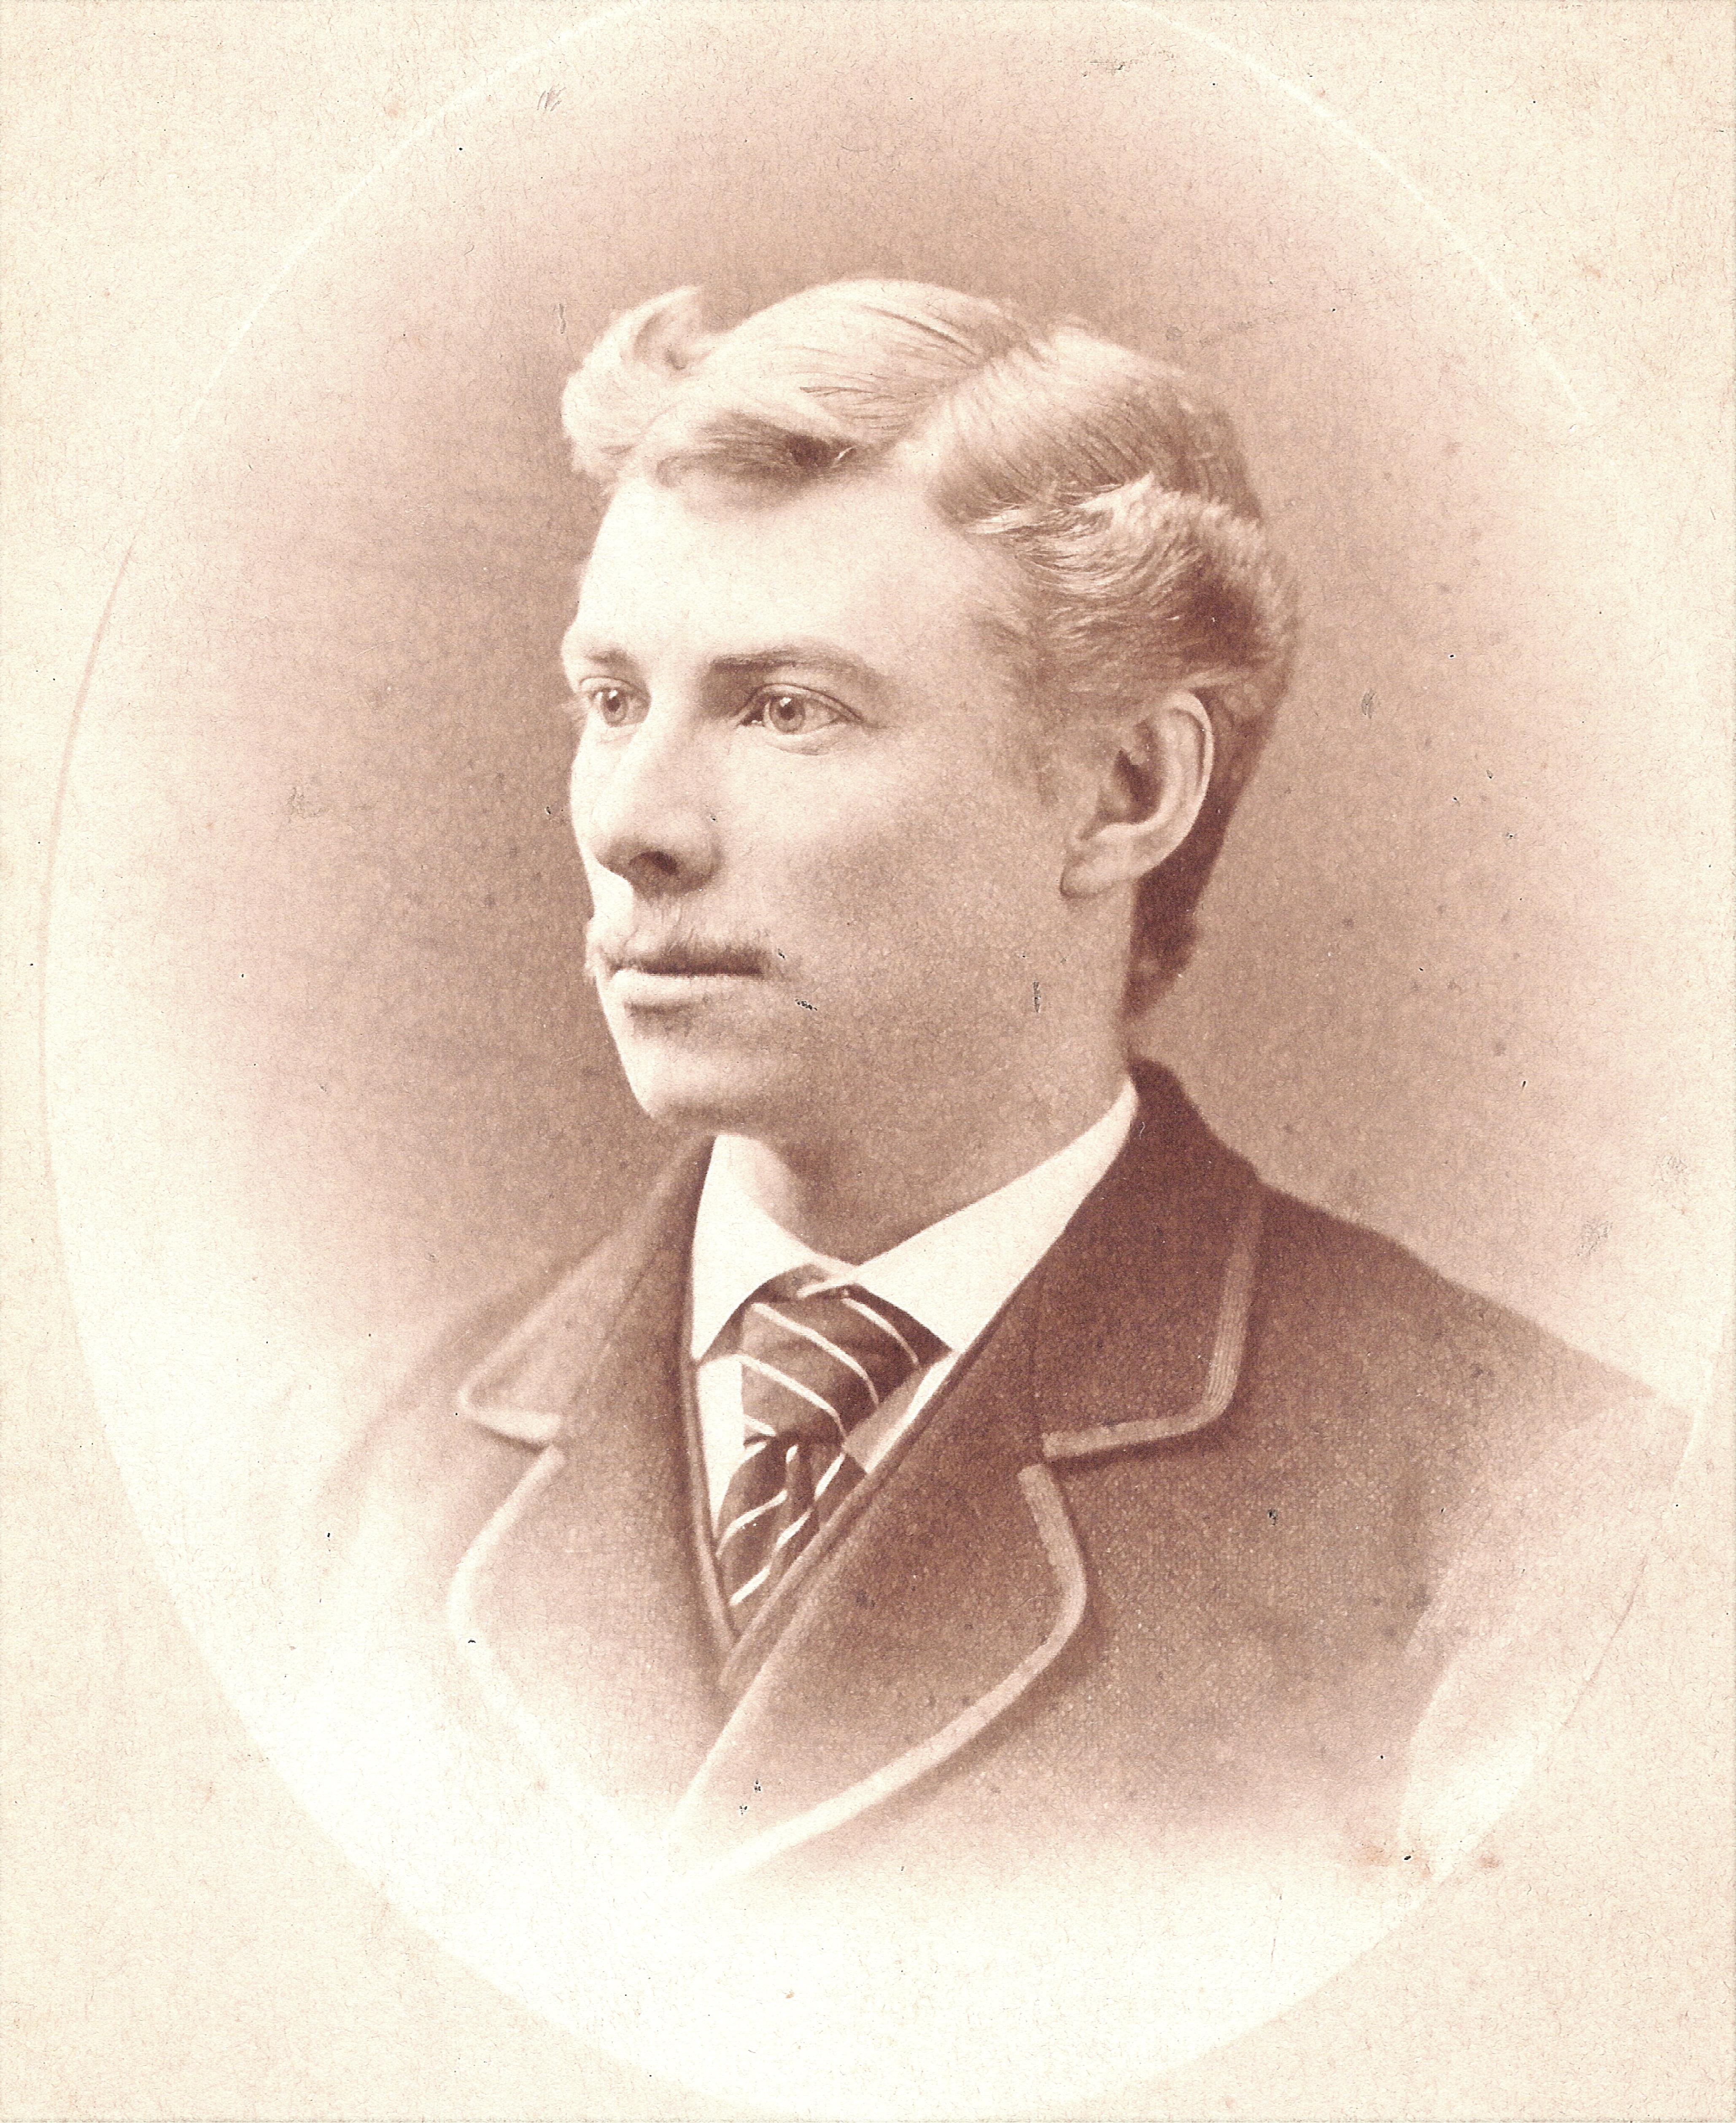 Moody in 1876